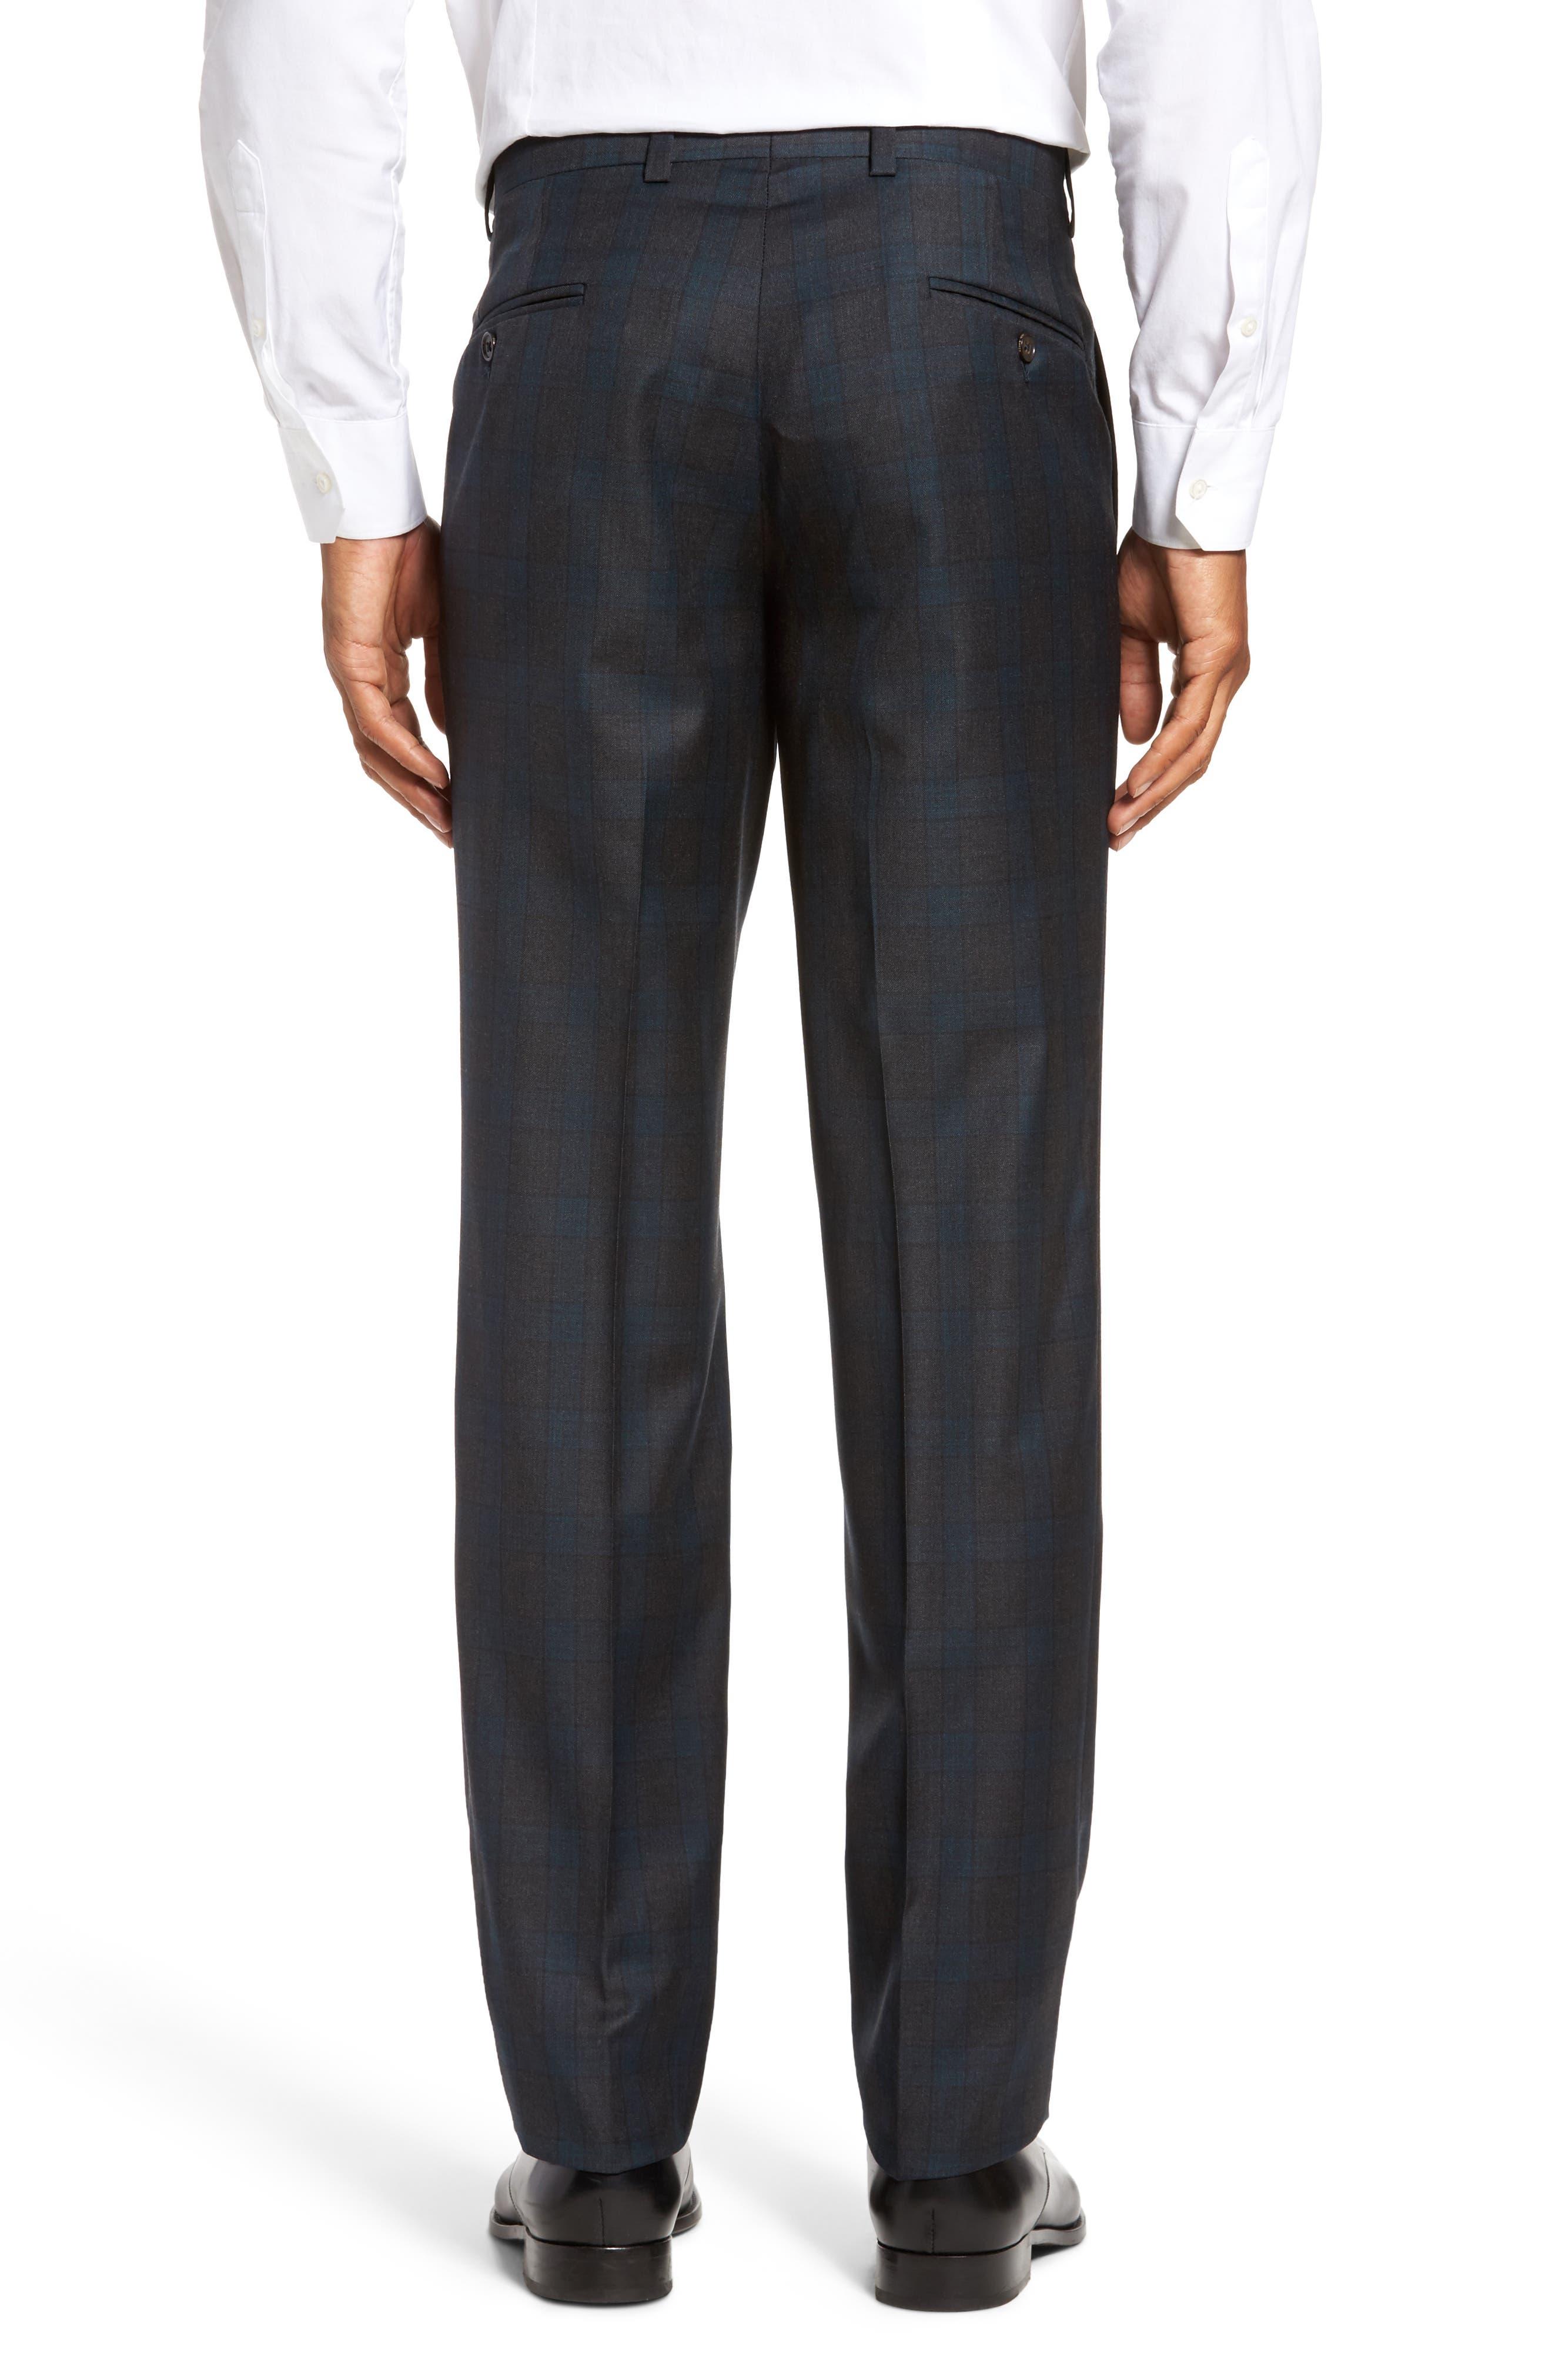 Jefferson Flat Front Plaid Wool Trousers,                             Alternate thumbnail 3, color,                             020